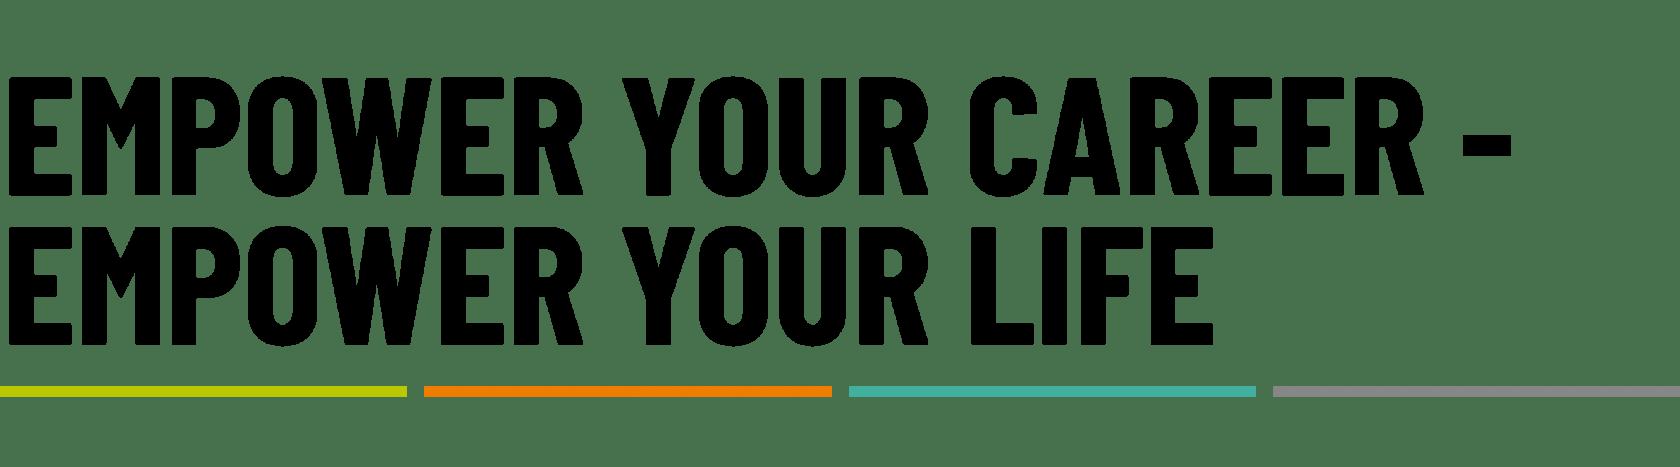 Header_Empower_Career_Tavola disegno 1